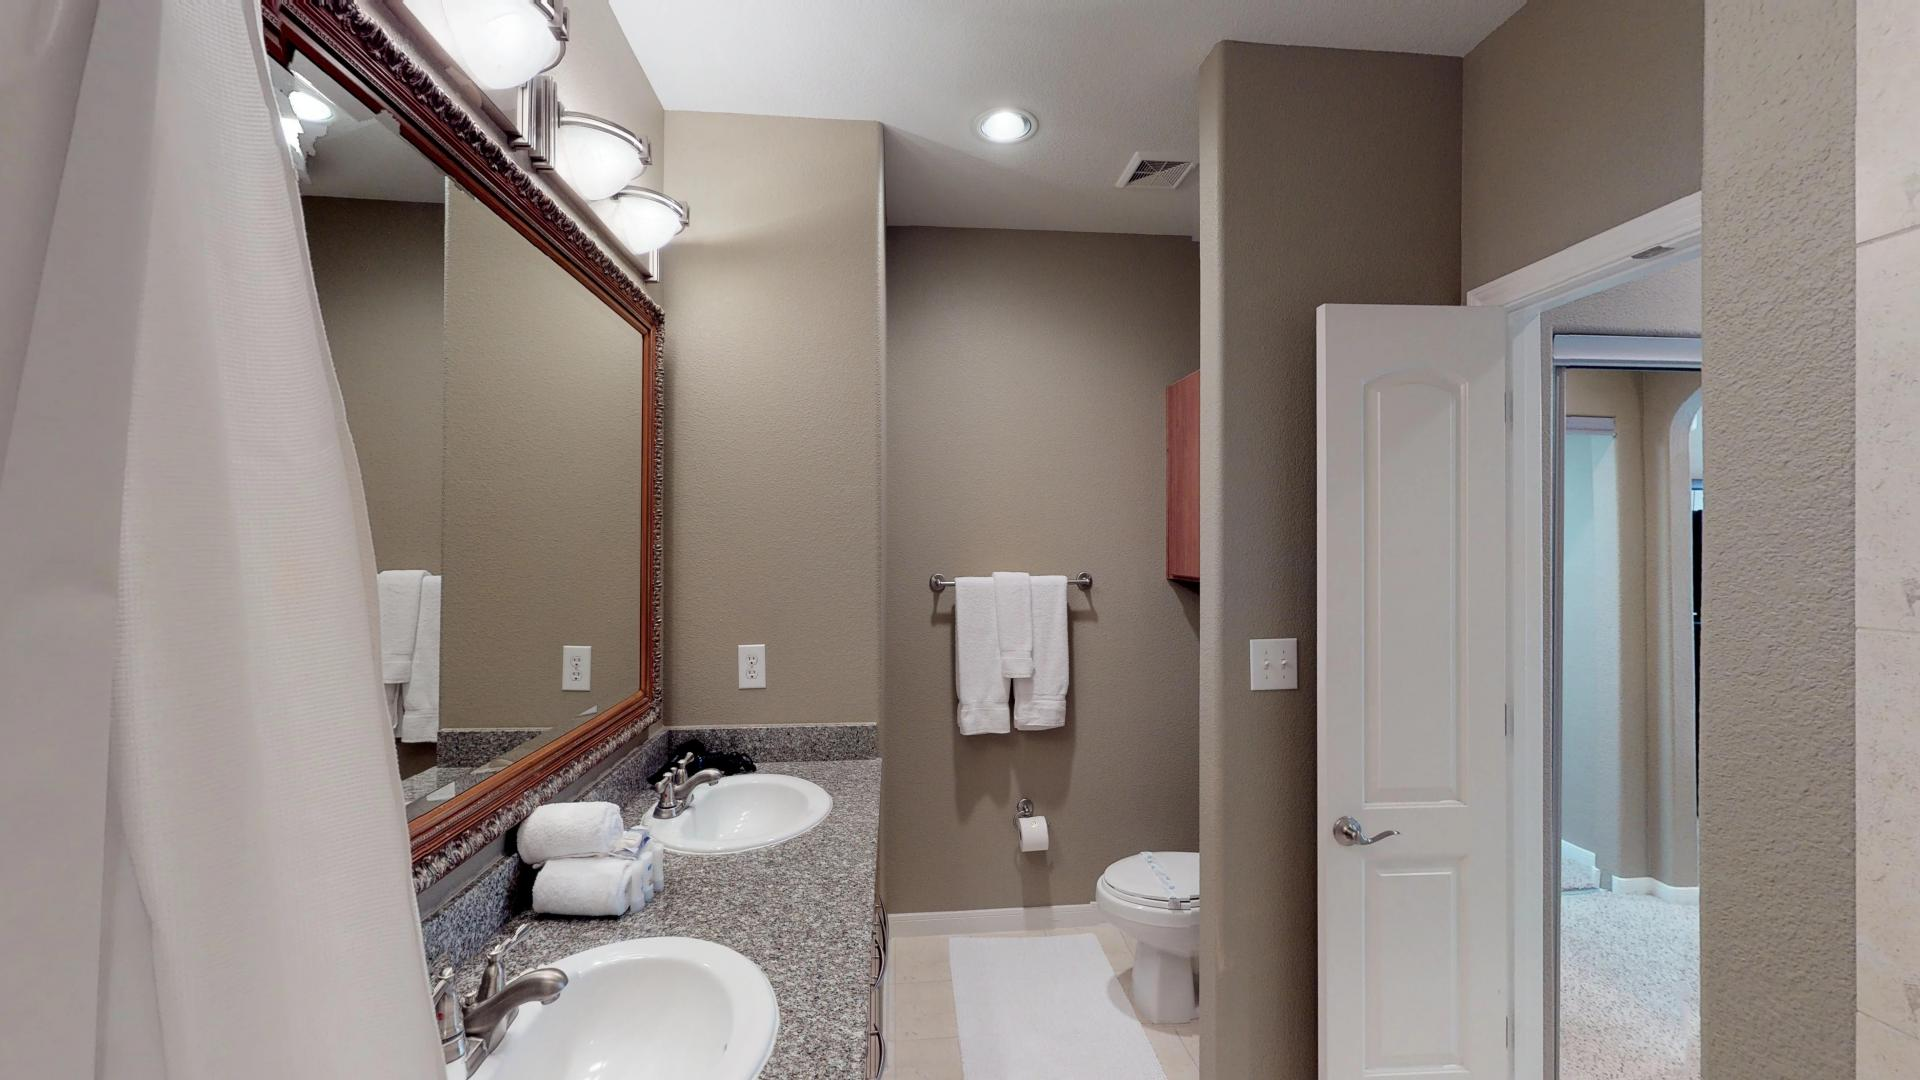 Bathroom at San Paloma Corporate Housing